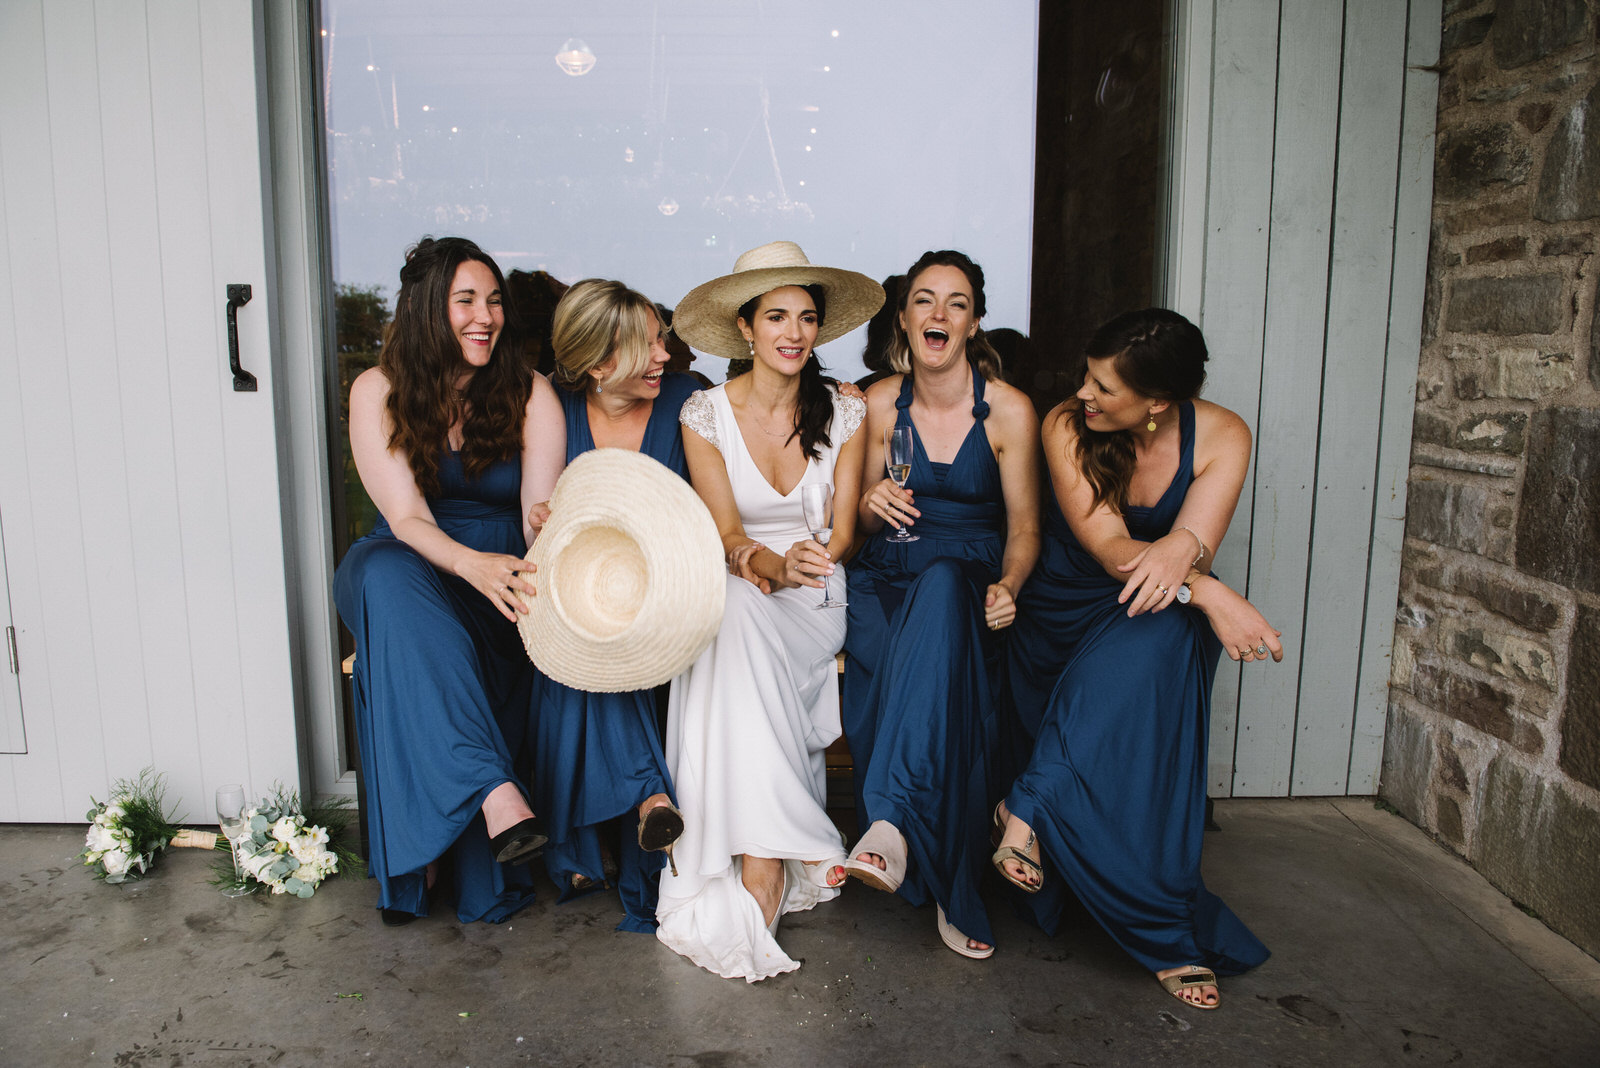 038-GUARDSWELL-FARM-WEDDING-ALTERNATIVE-SCOTTISH-WEDDING-PHOTOGRAPHER-SCOTTISH-WEDDING-DESTINATION-WEDDING-PHOTOGRAPHER.JPG